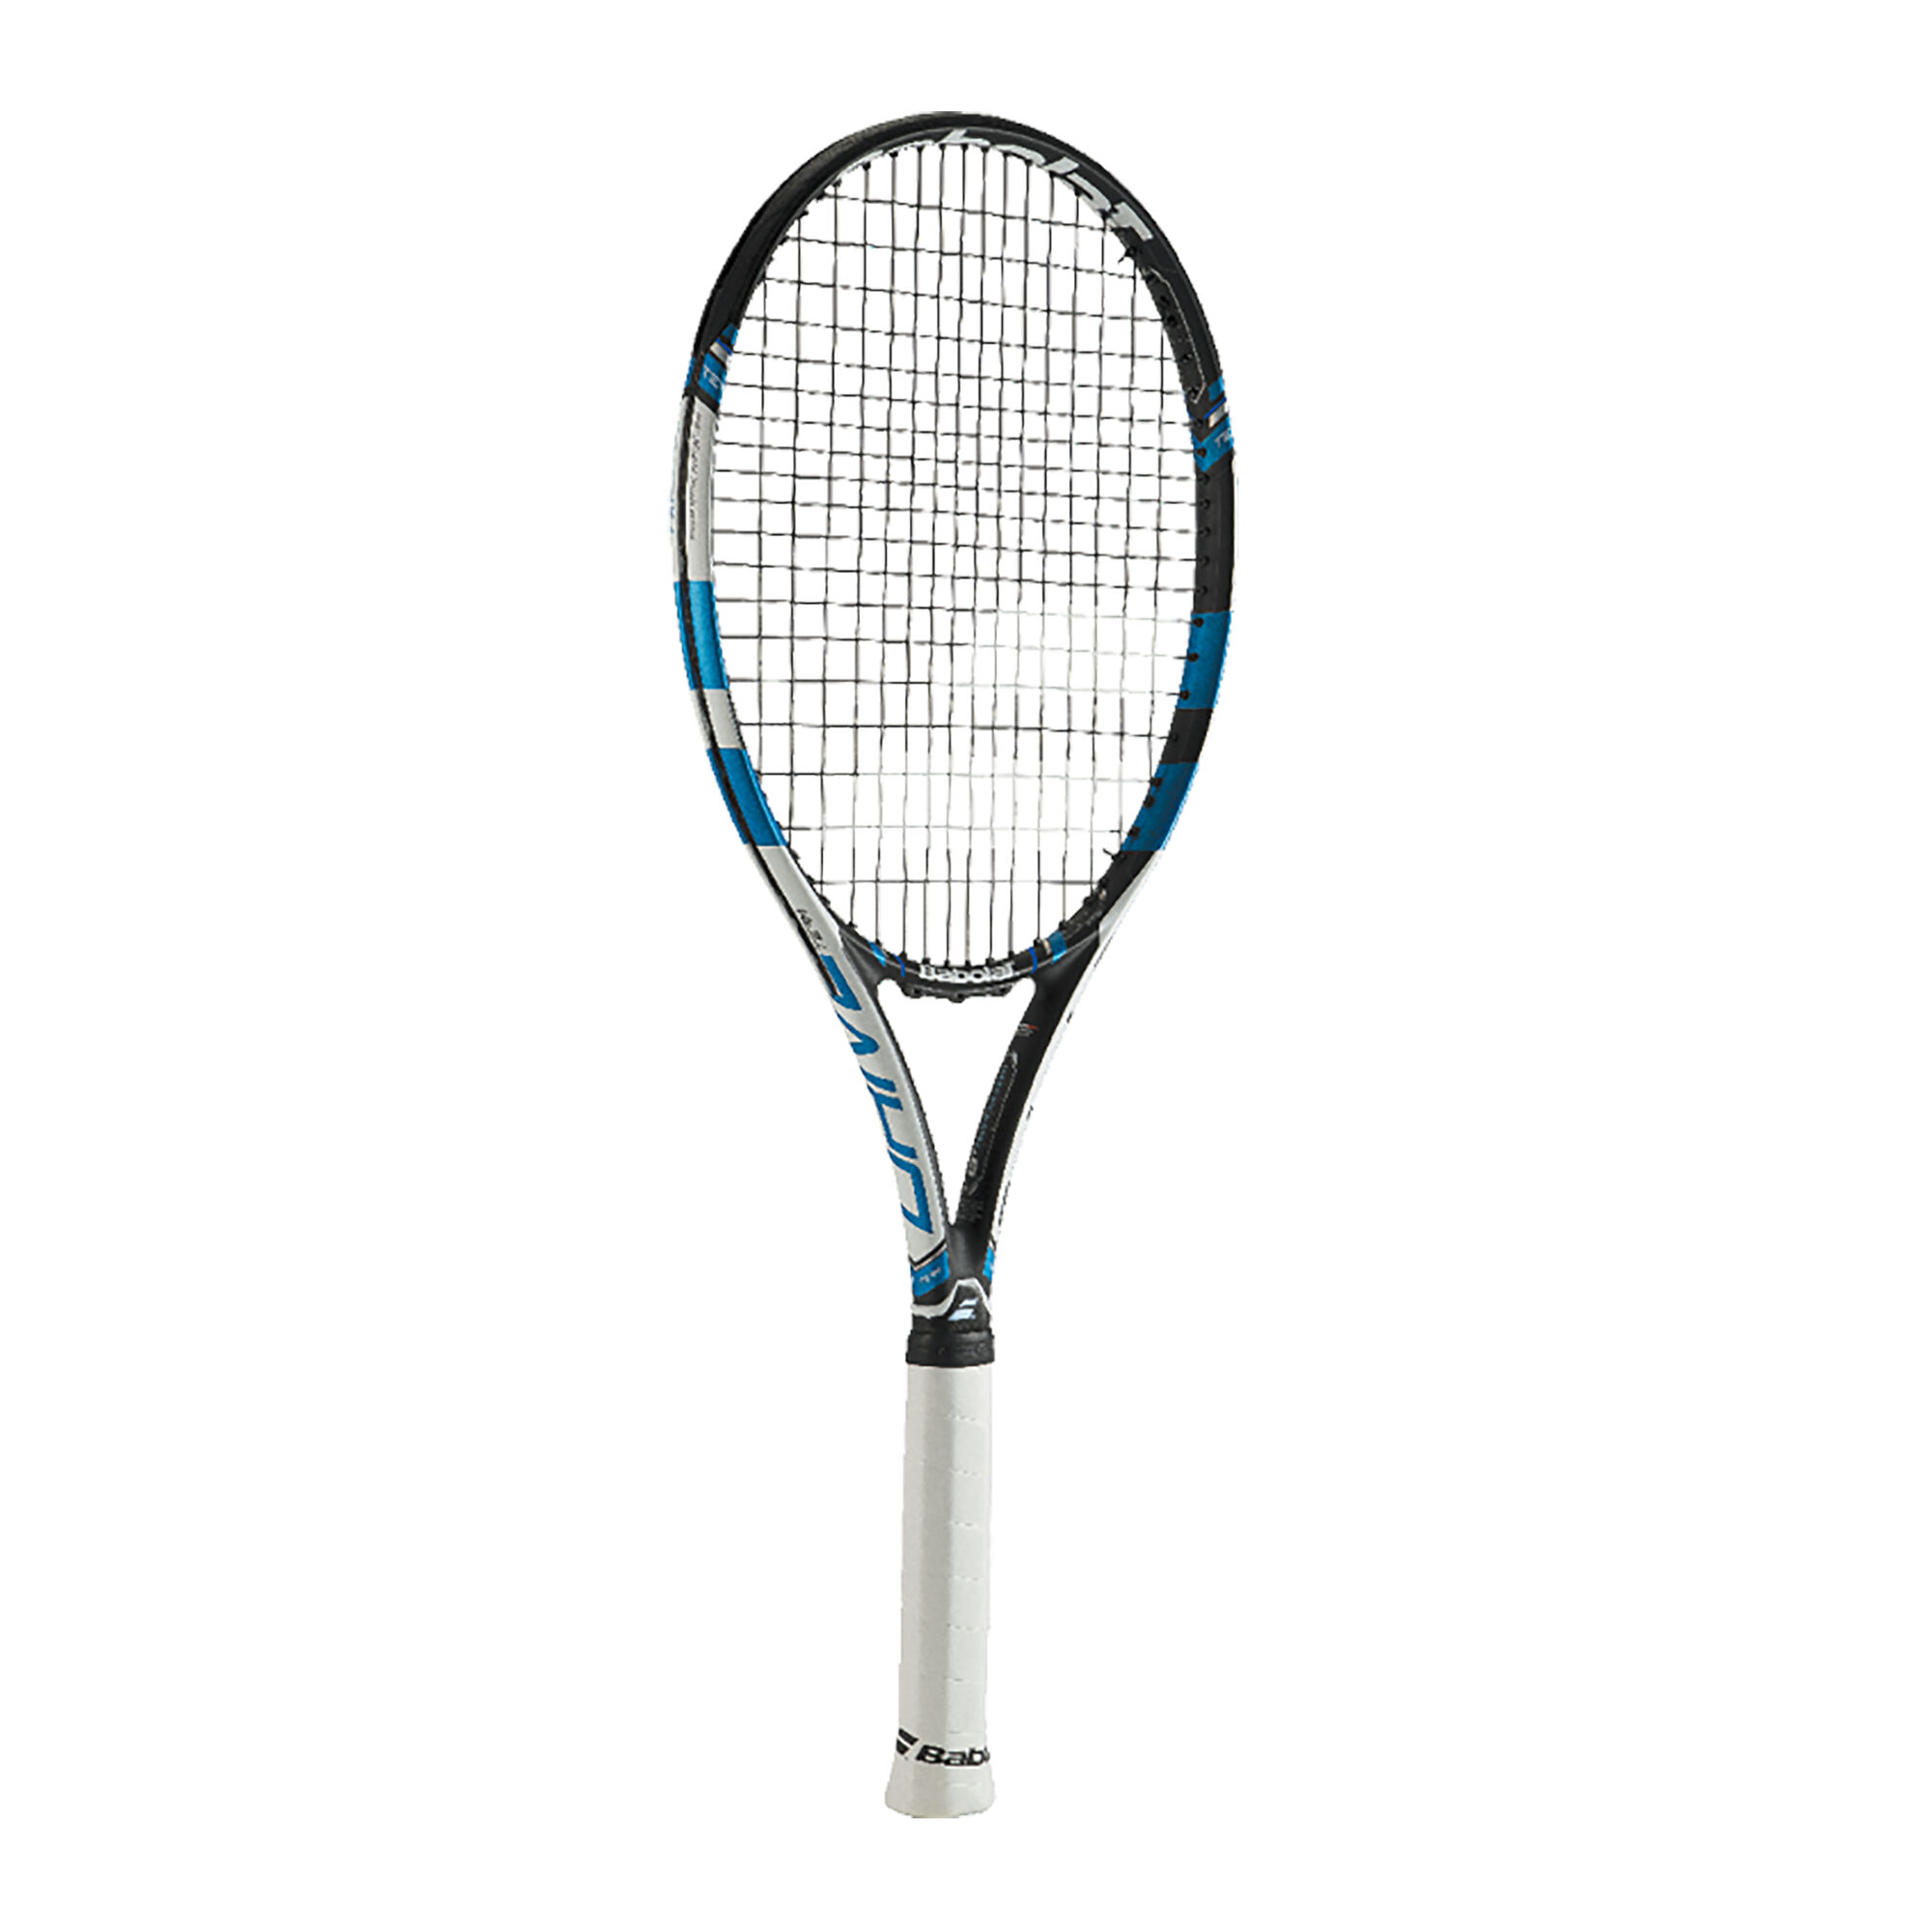 4a6b452cf Babolat Pure Drive Super Lite (Usado) compra online | Tennis-Point